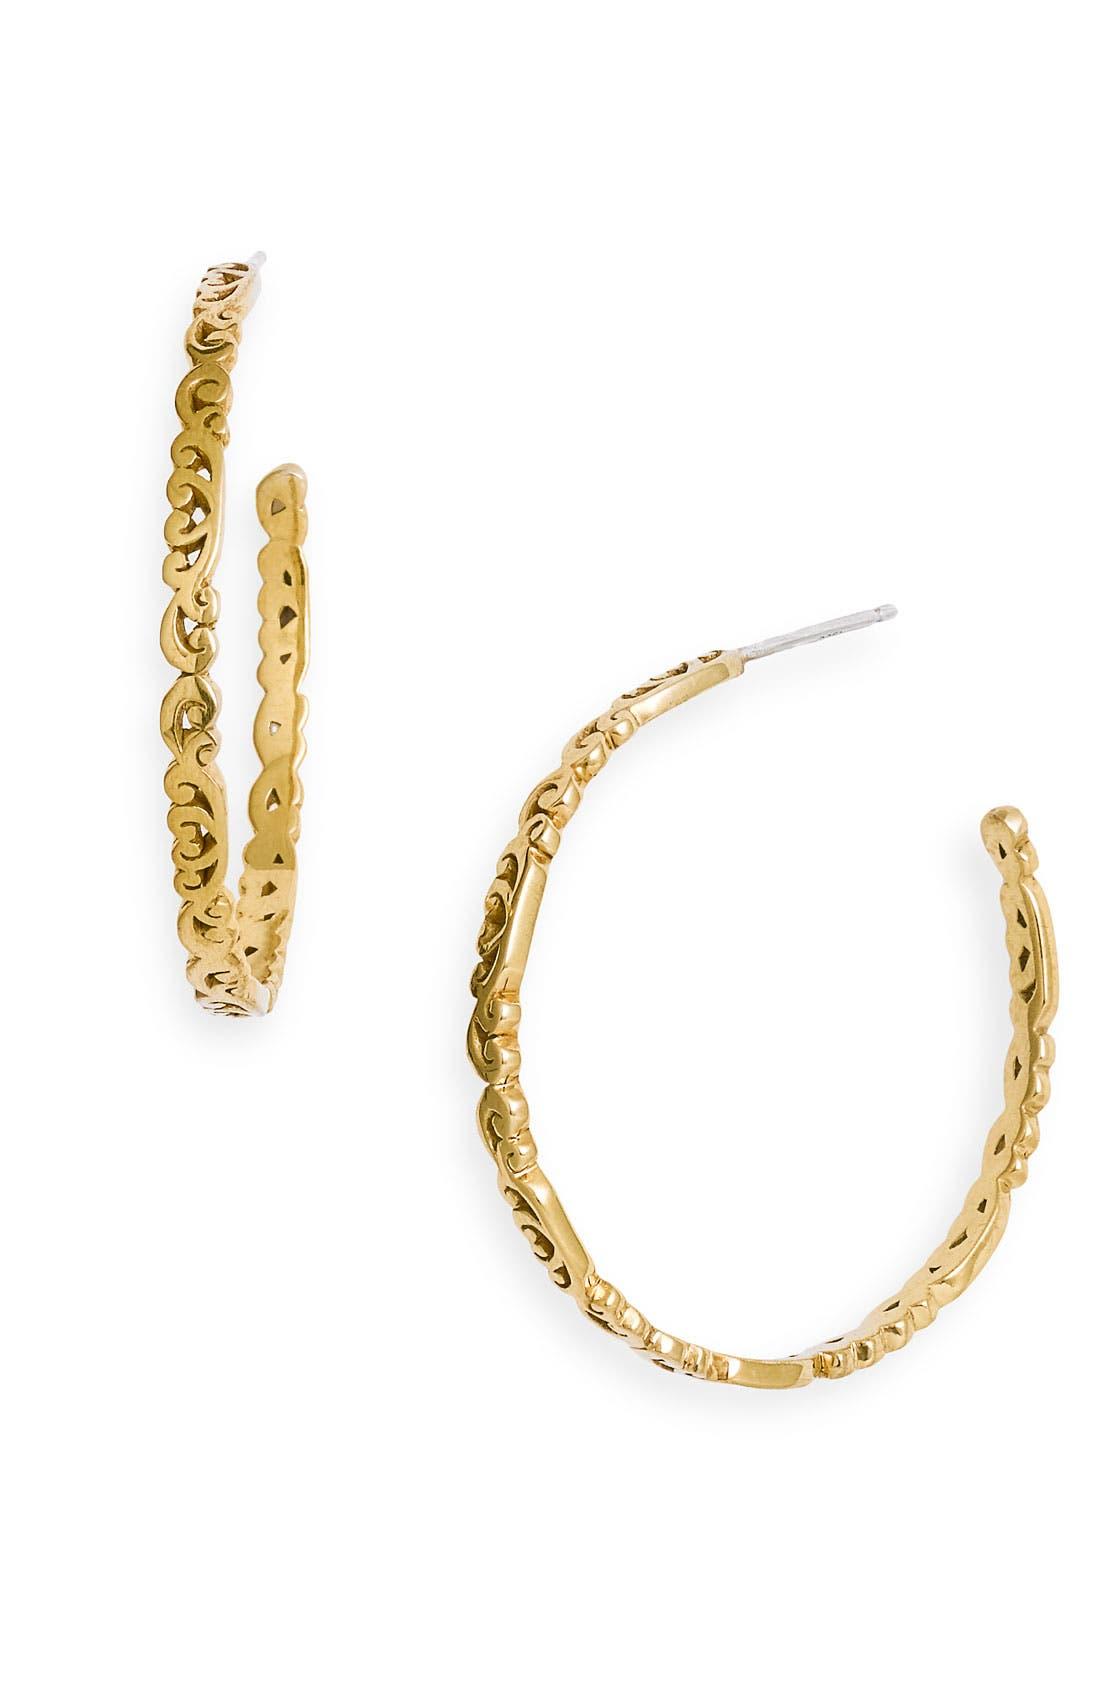 Alternate Image 1 Selected - Lois Hill 'Two Tone Organic Geo' Thin Scroll Hoop Earrings